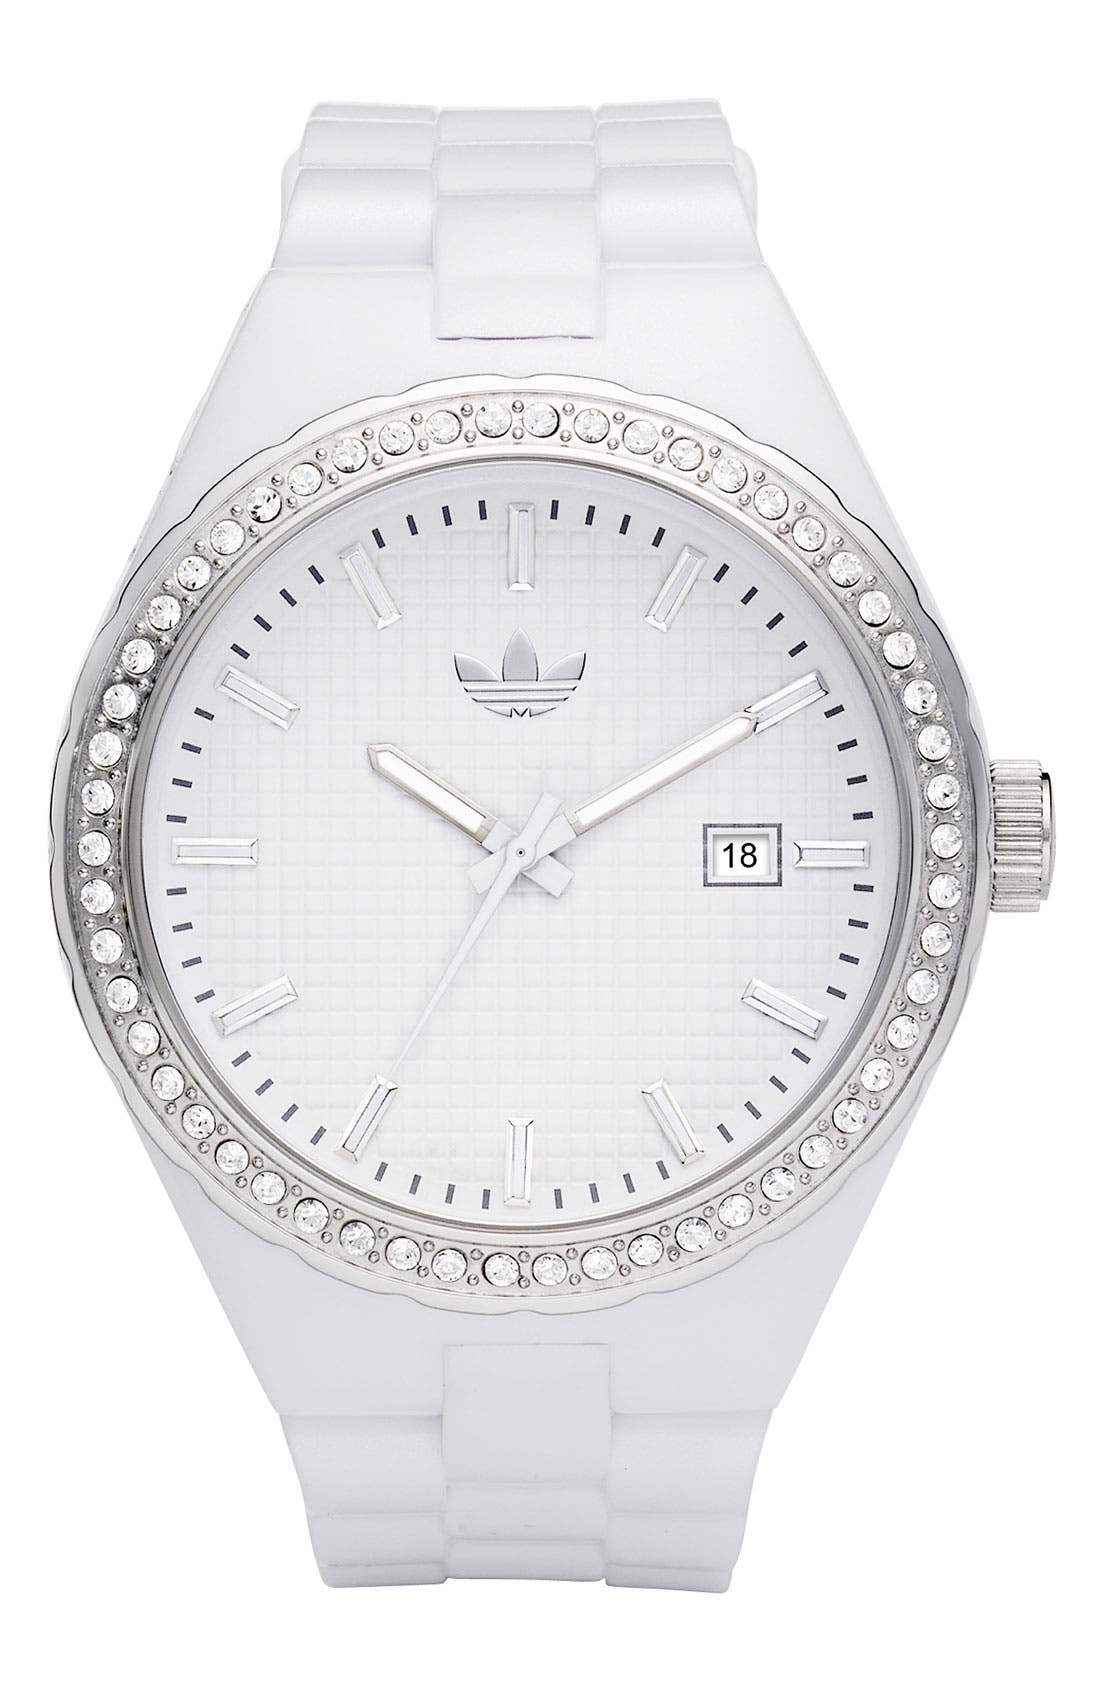 Main Image - adidas Originals 'Cambridge' Crystal Accent Watch, 44mm